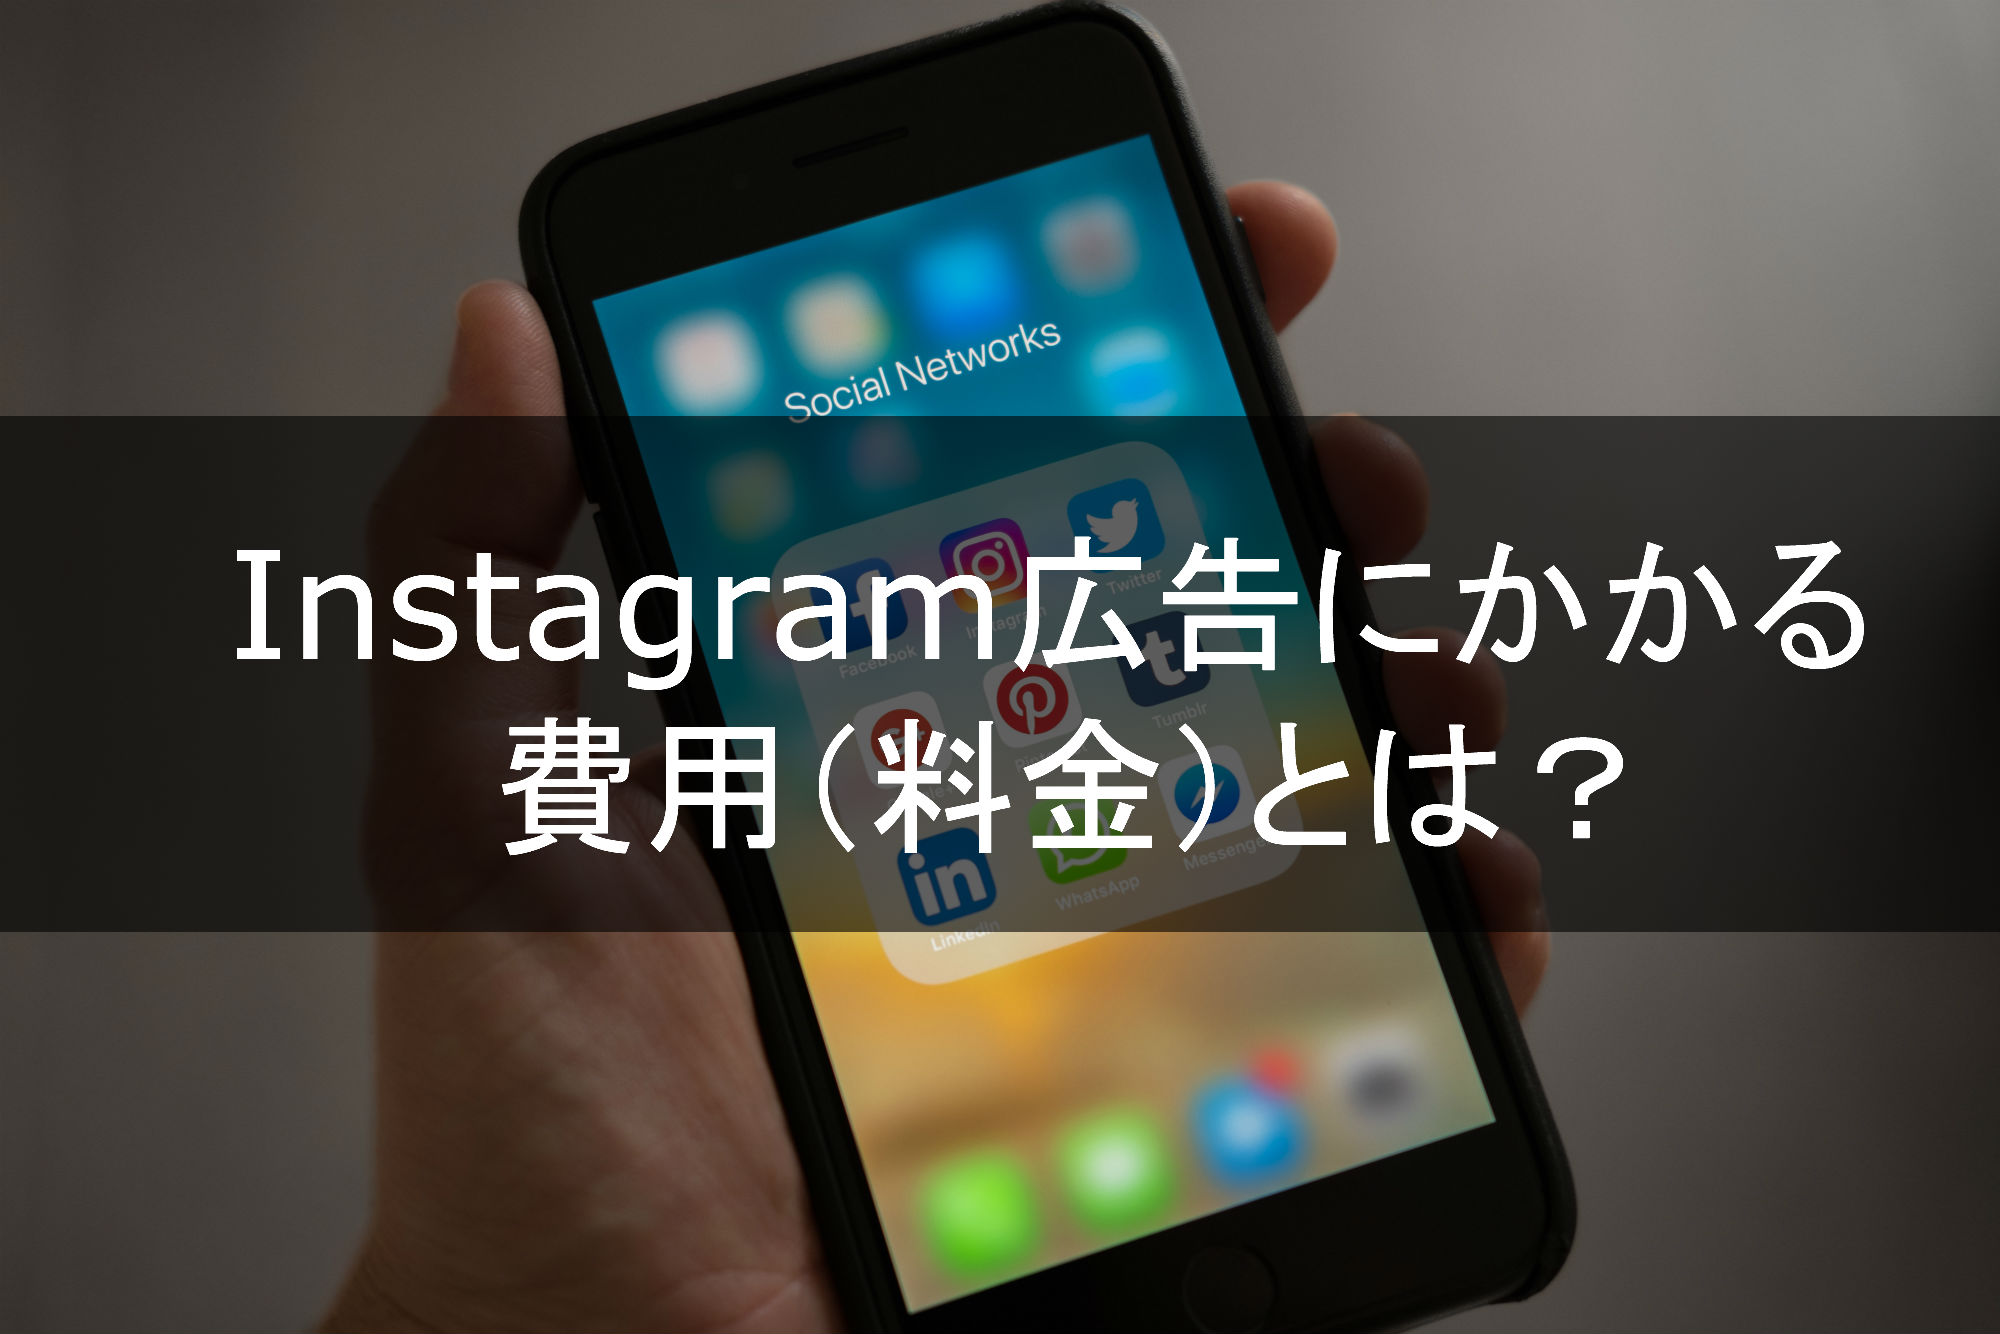 Instagram広告にかかる費用(料金)とは?